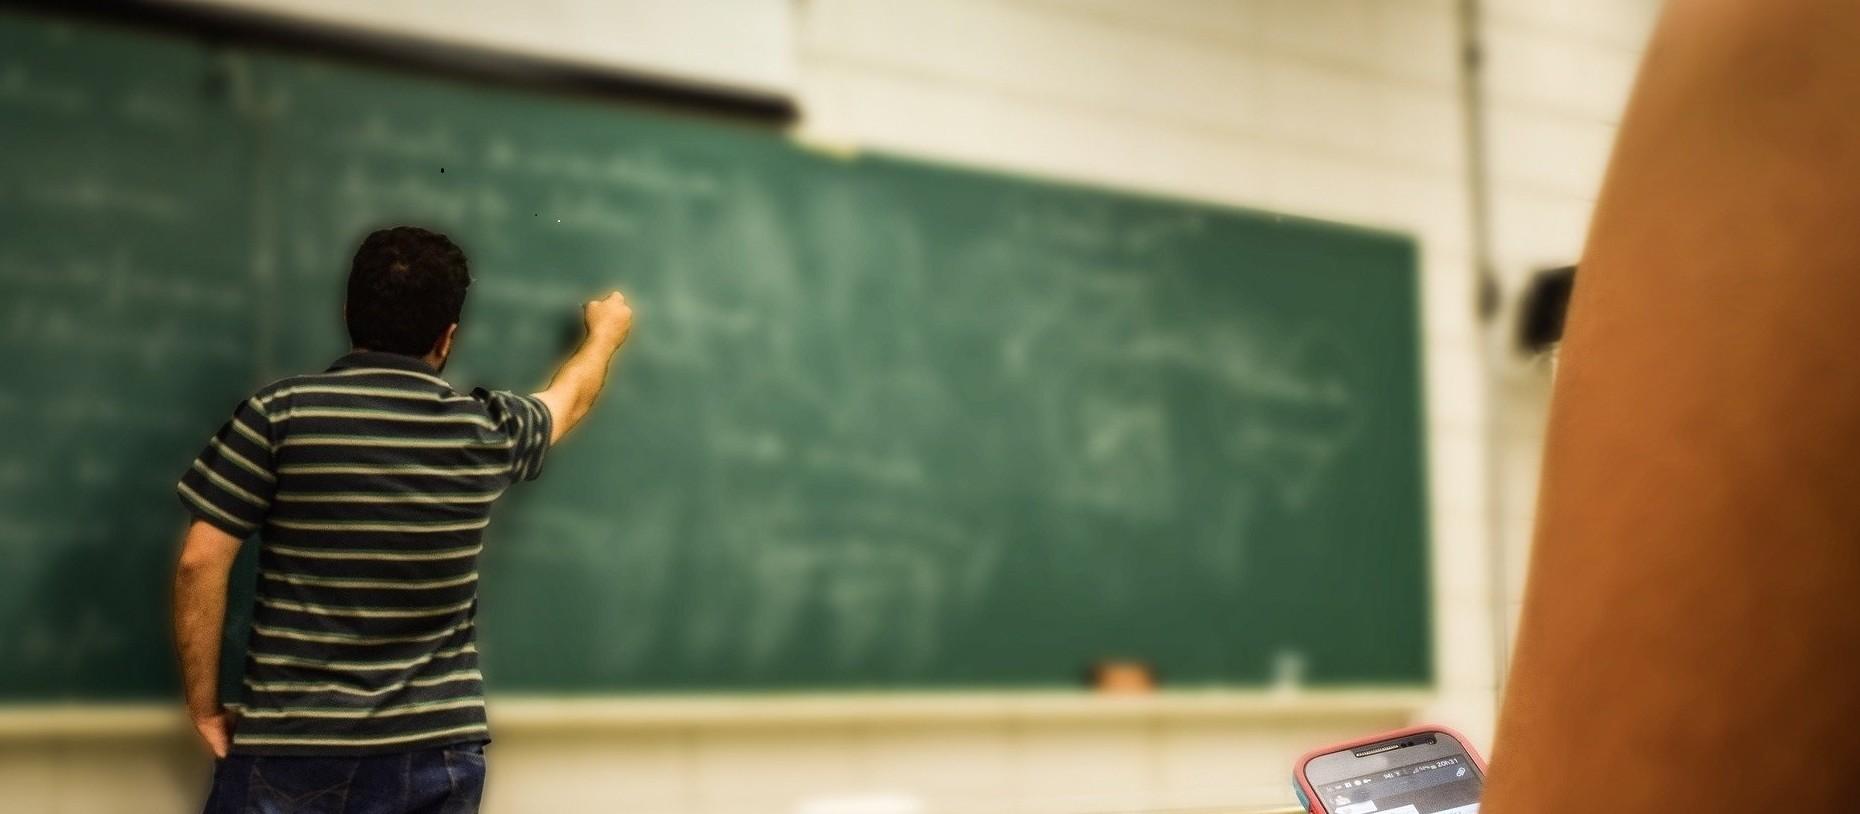 Vamos falar sobre... as aulas presenciais